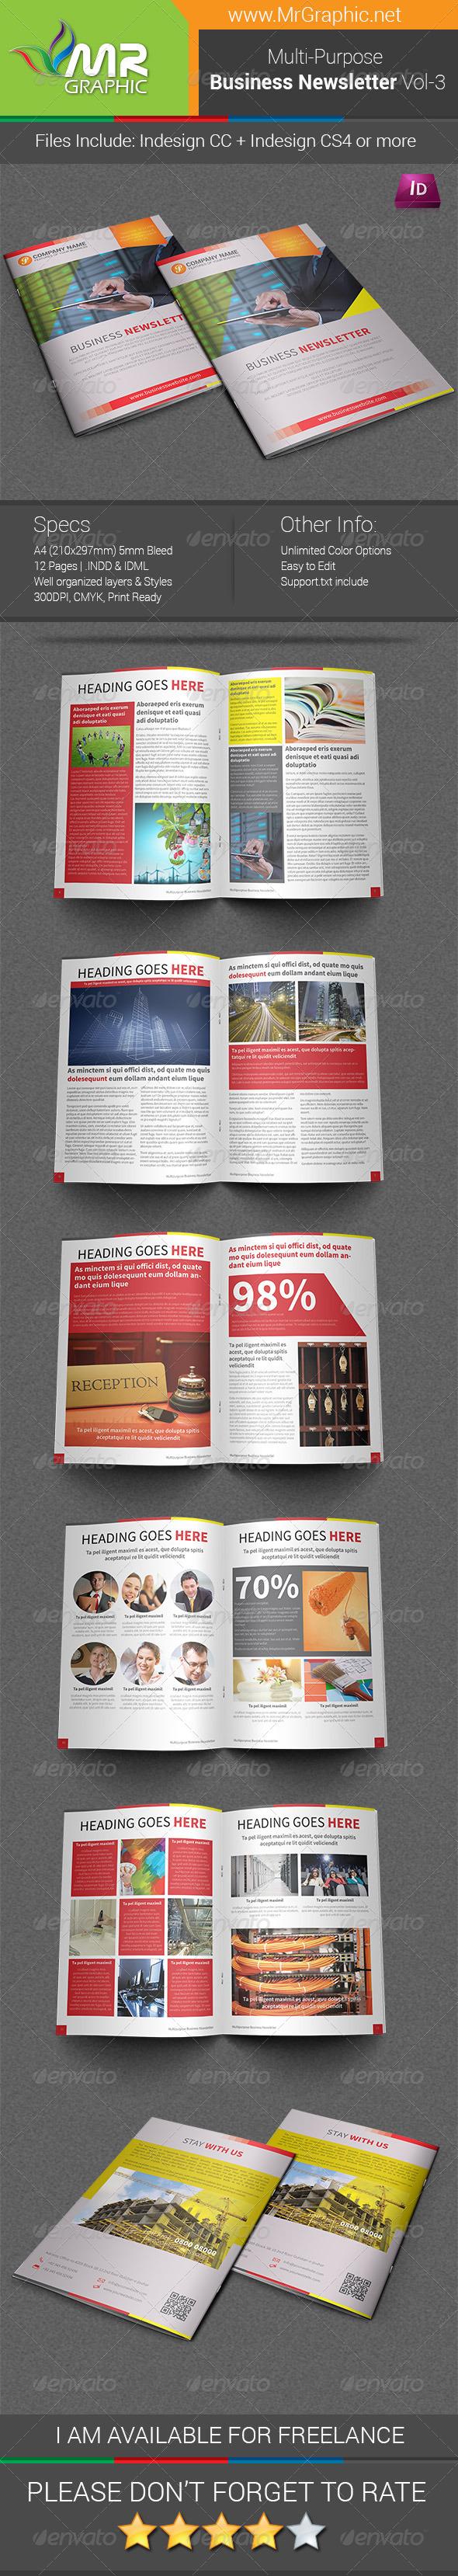 Multipurpose Business Newsletter Template Vol-03 - Newsletters Print Templates